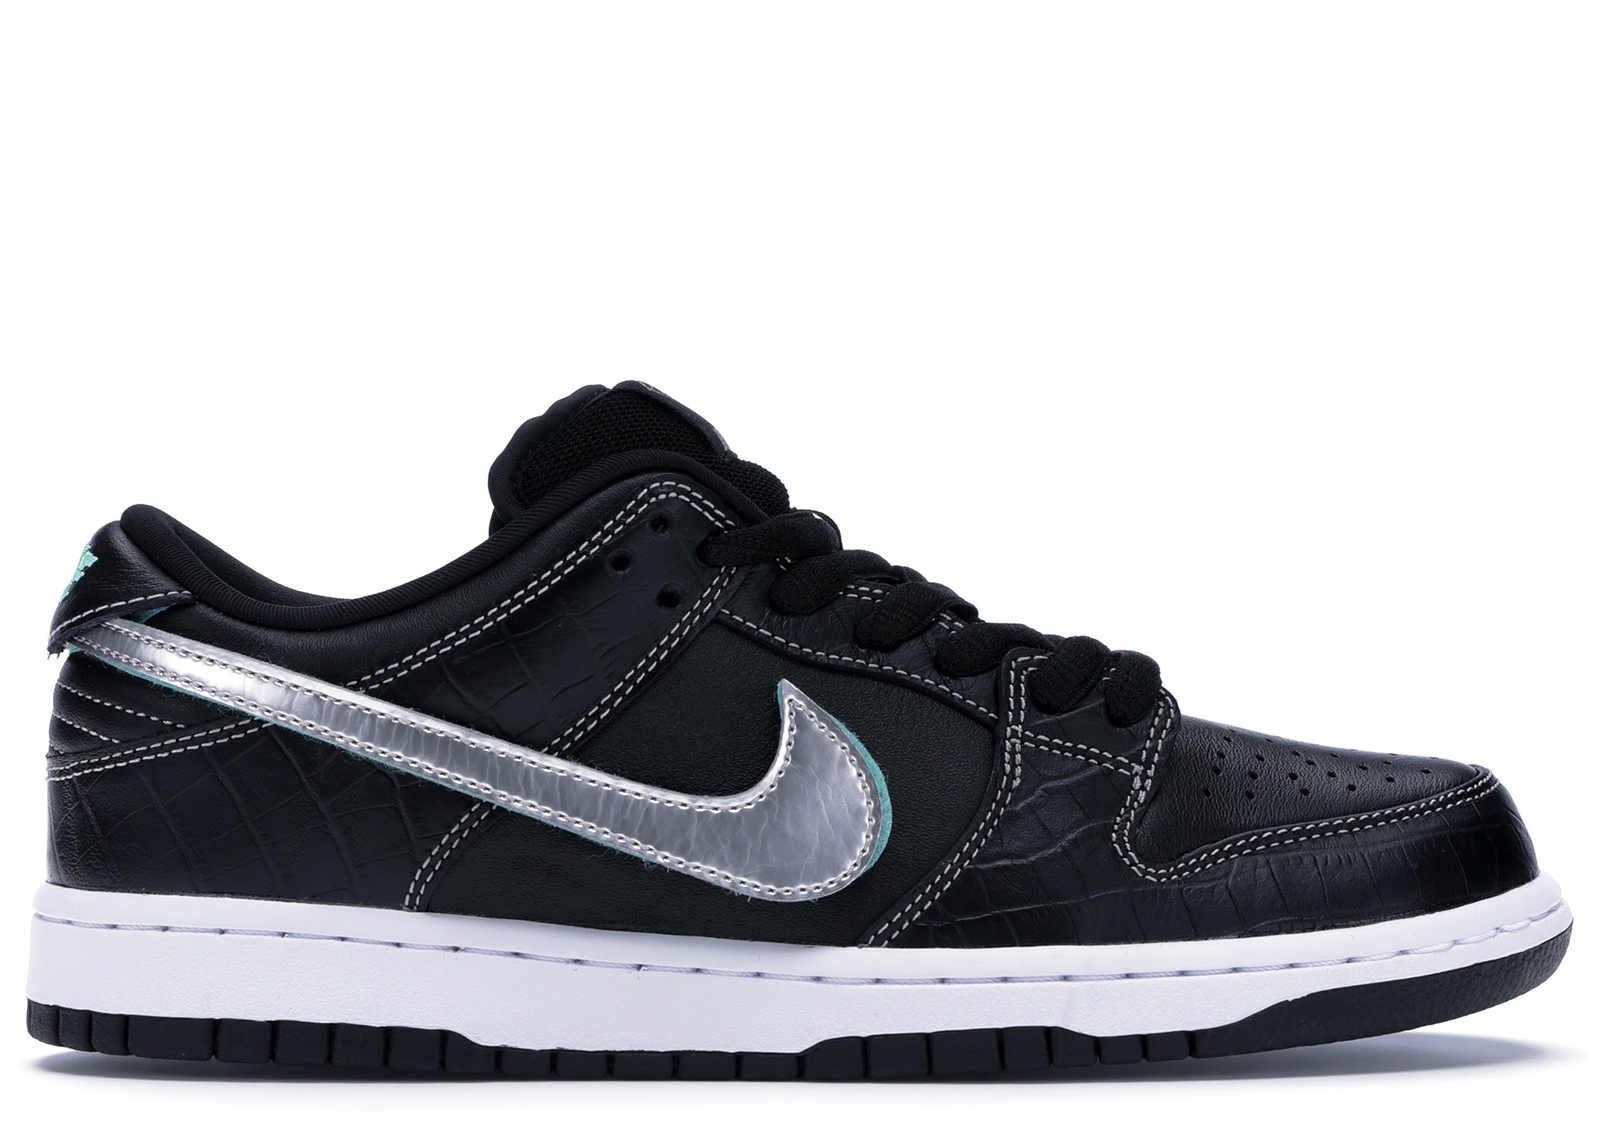 Nike SB Dunk Low Diamond Supply Co